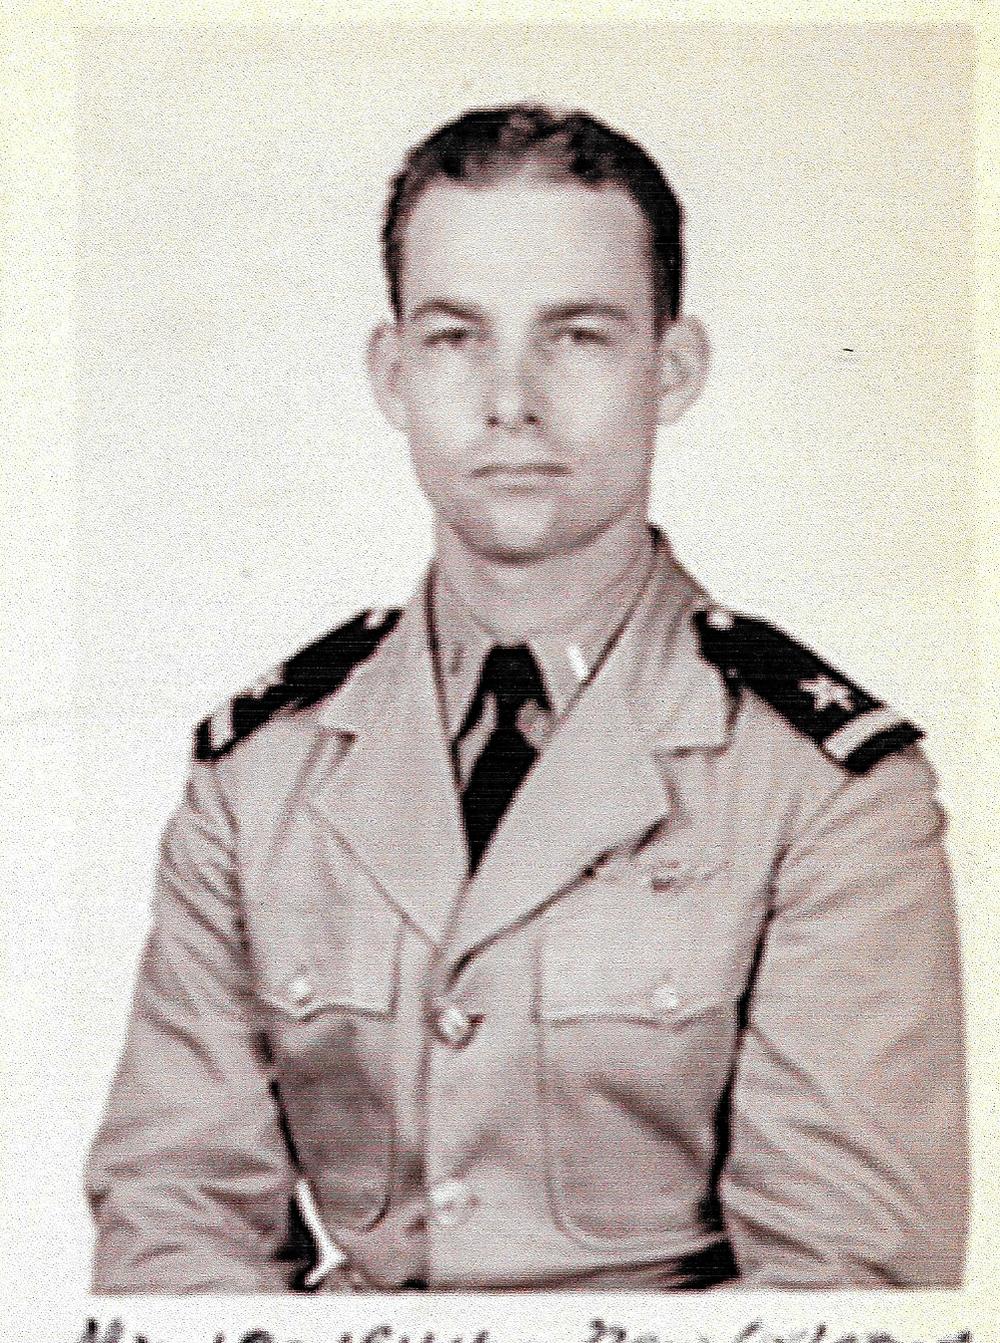 Lt. (JG) Barney Word Jarvis, US Navy